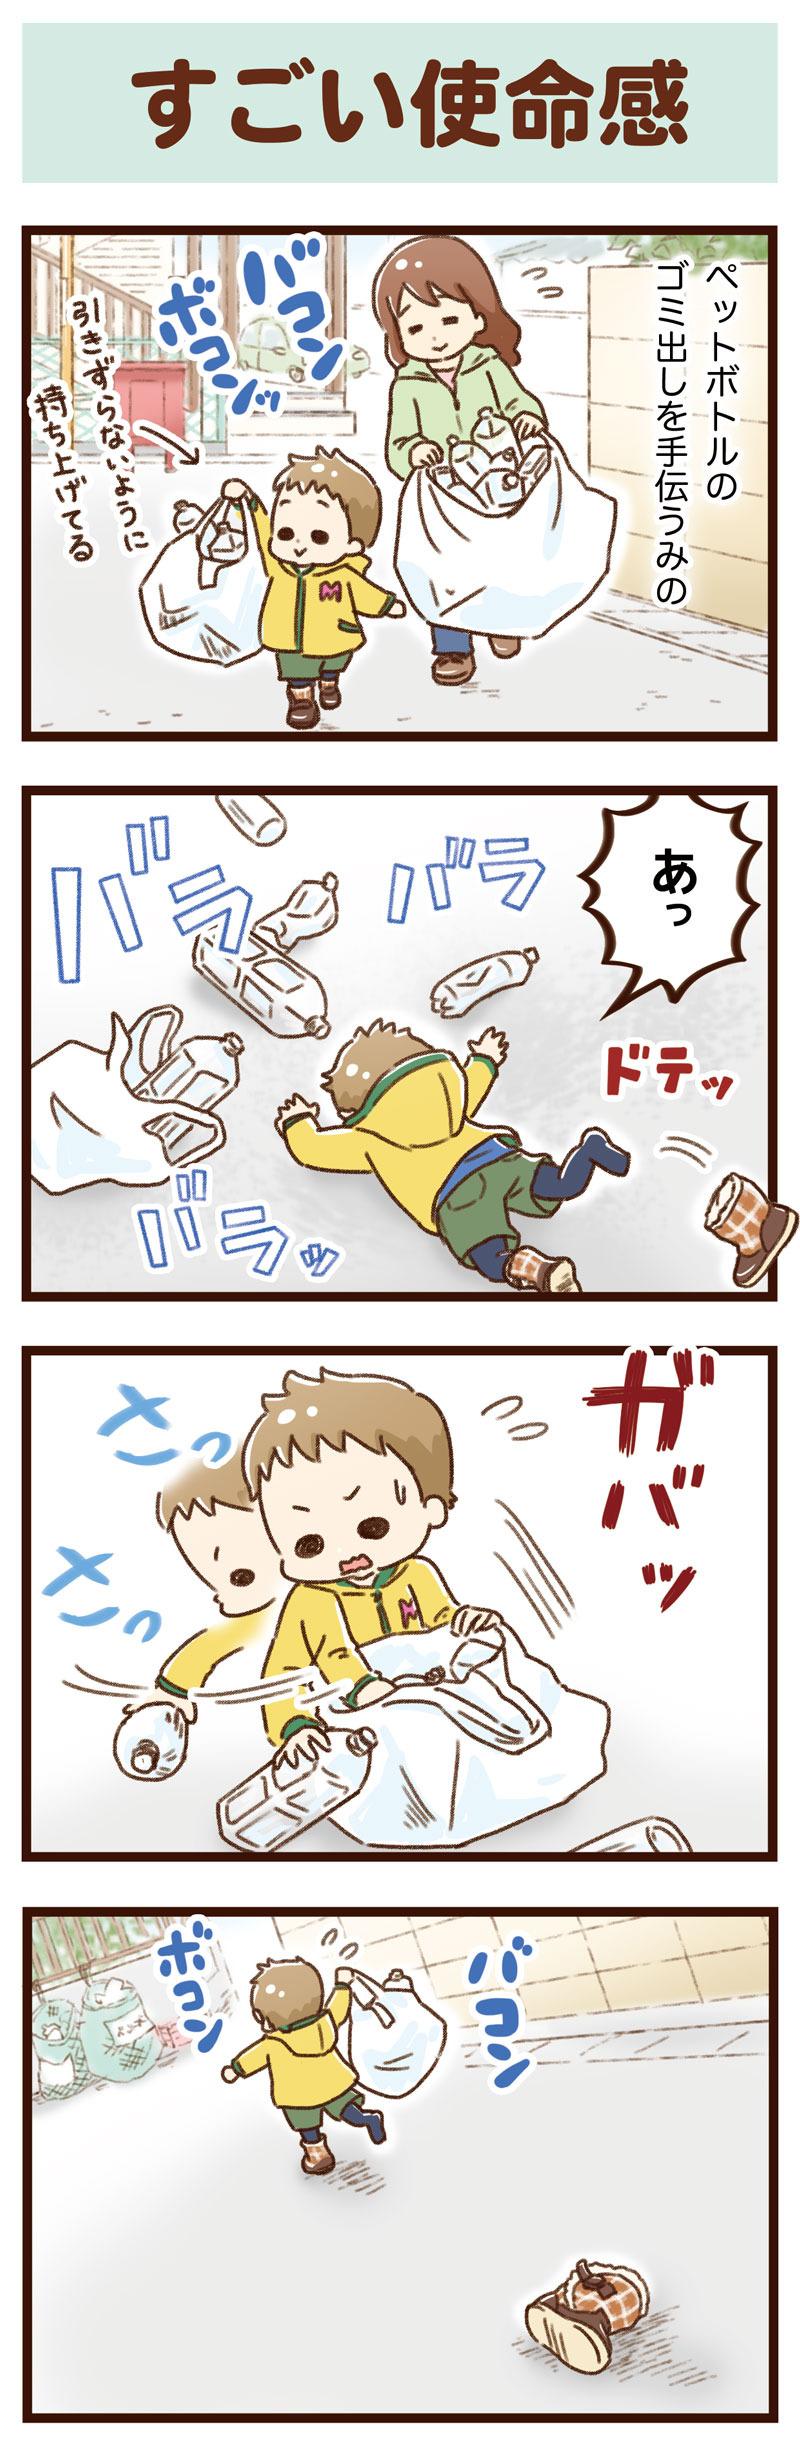 yumui266-1